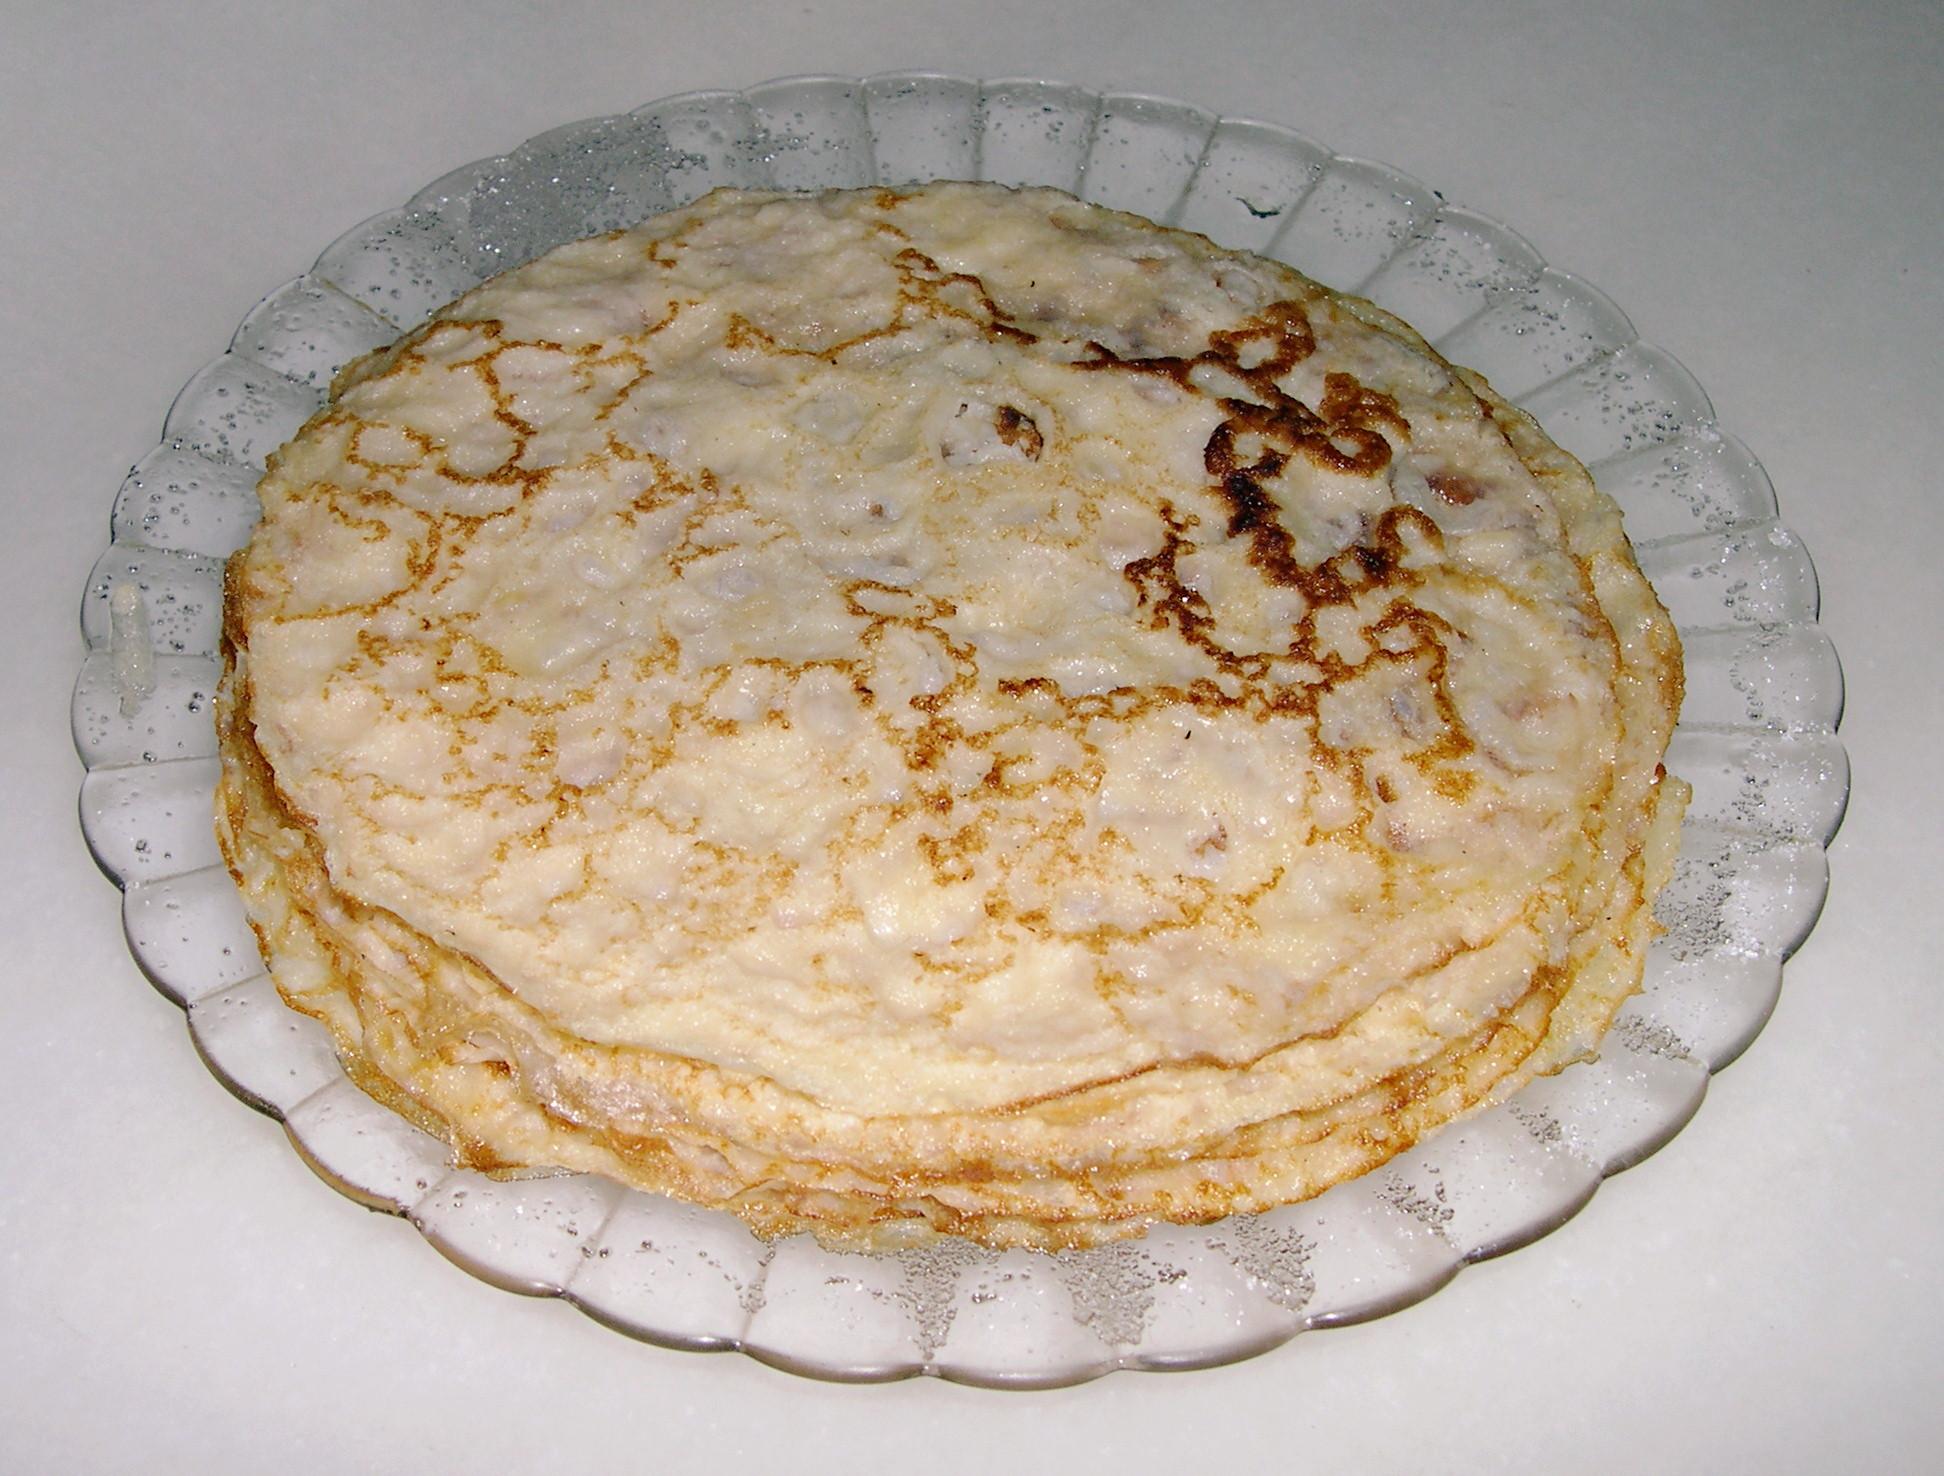 http://upload.wikimedia.org/wikipedia/commons/f/fb/Frixuelos-fayuelos.jpg